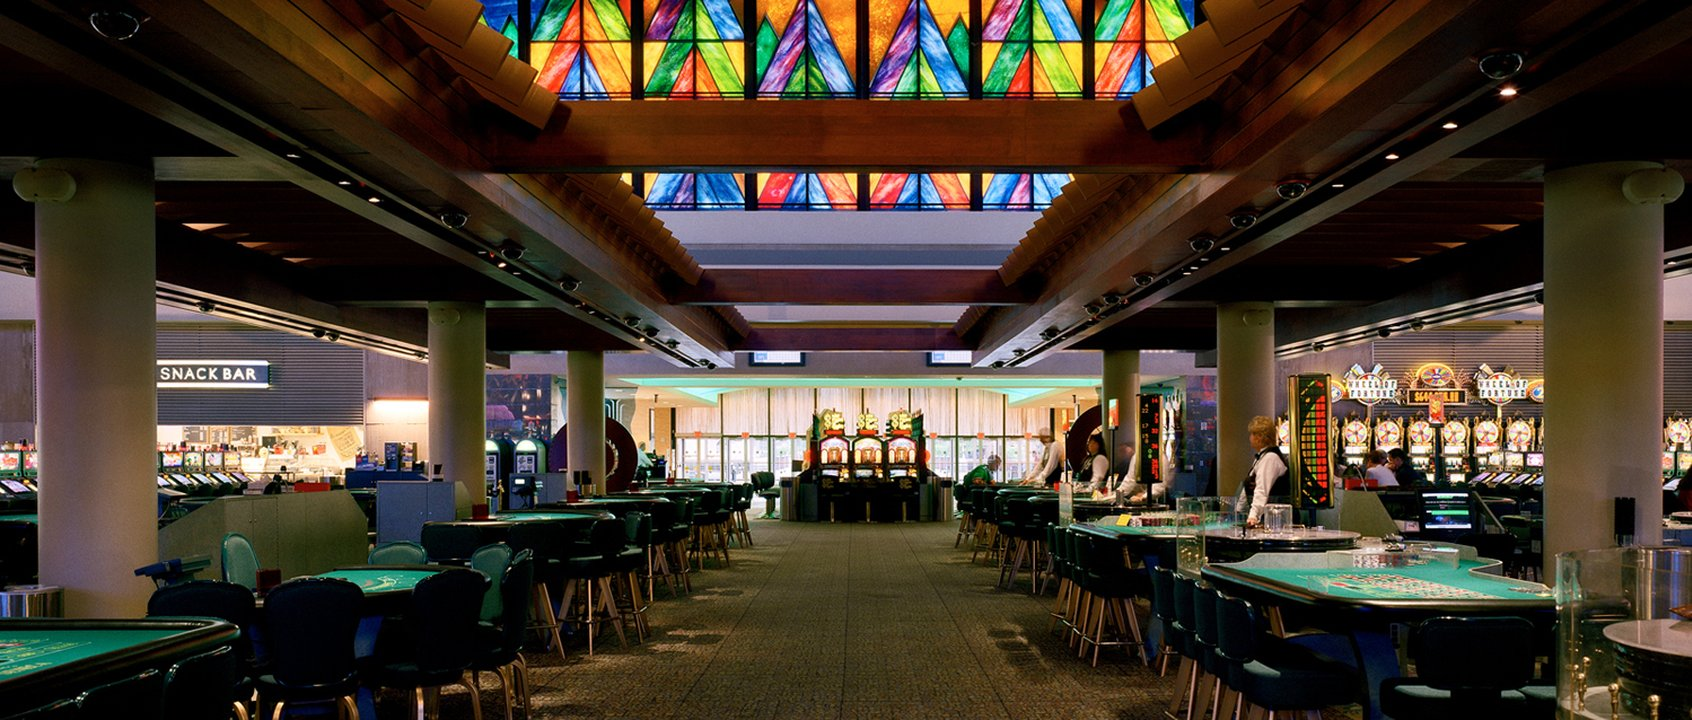 Seneca niagara casino restaurant napoleon casino hull